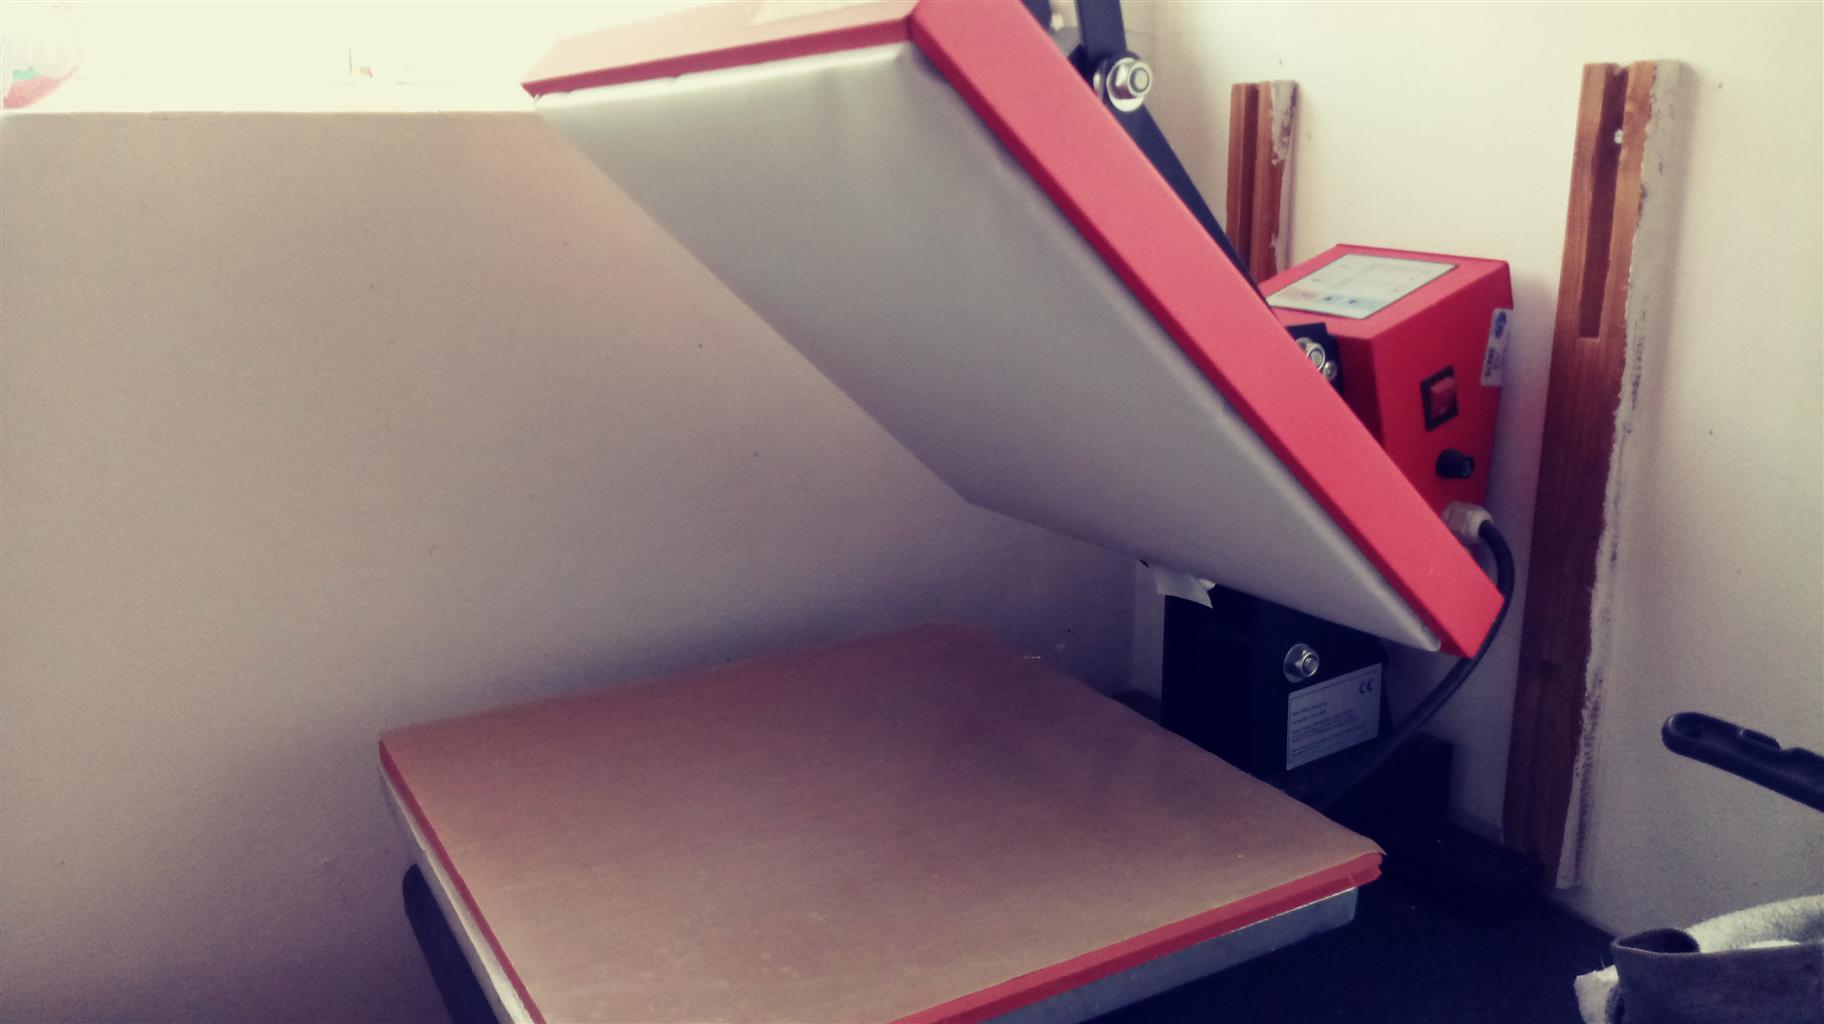 Sawgrass printer and heatpress brand new. Printer needs ink